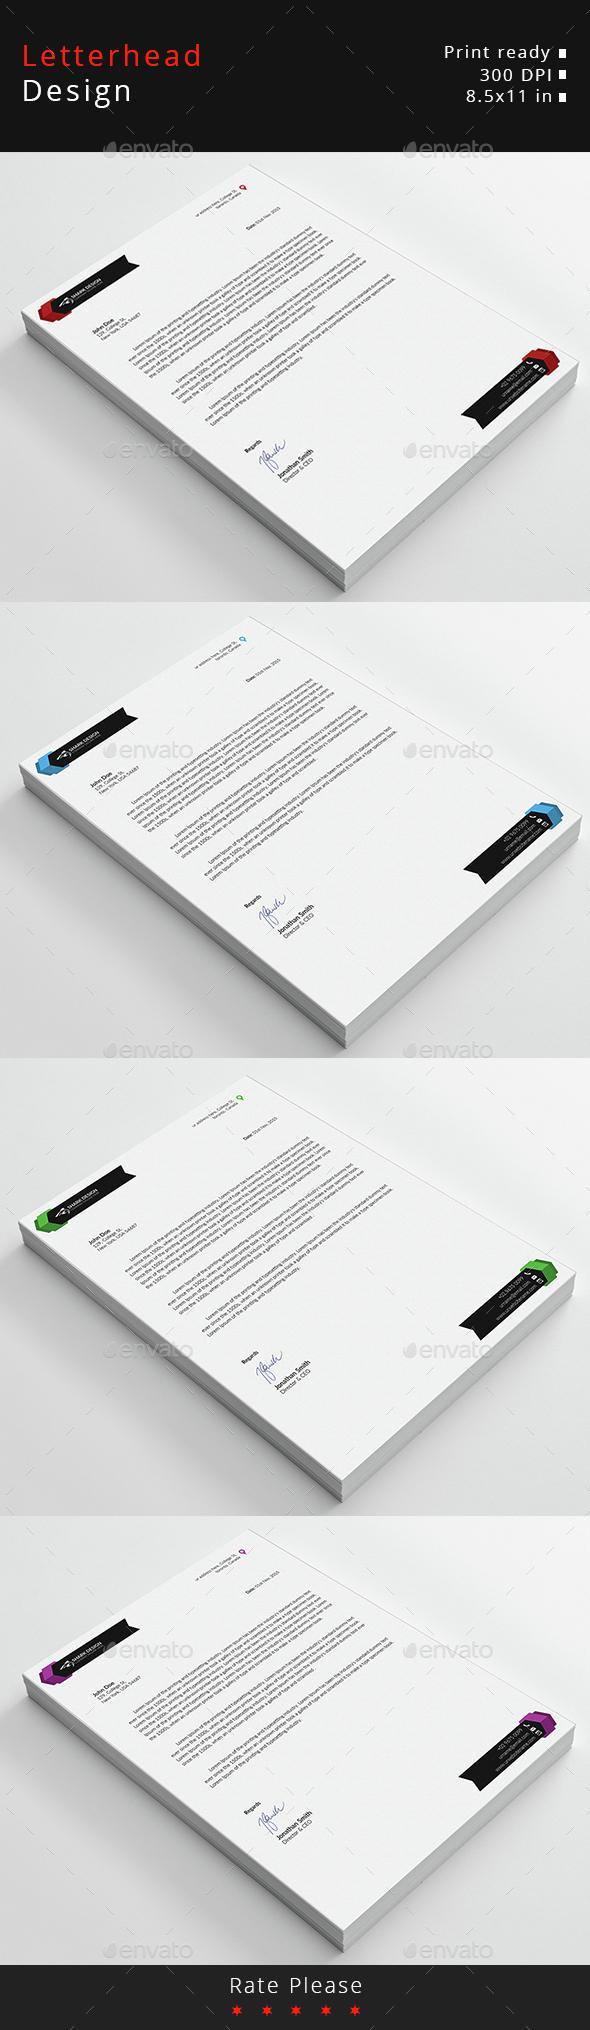 Letterhead design design templates from graphicriver spiritdancerdesigns Gallery